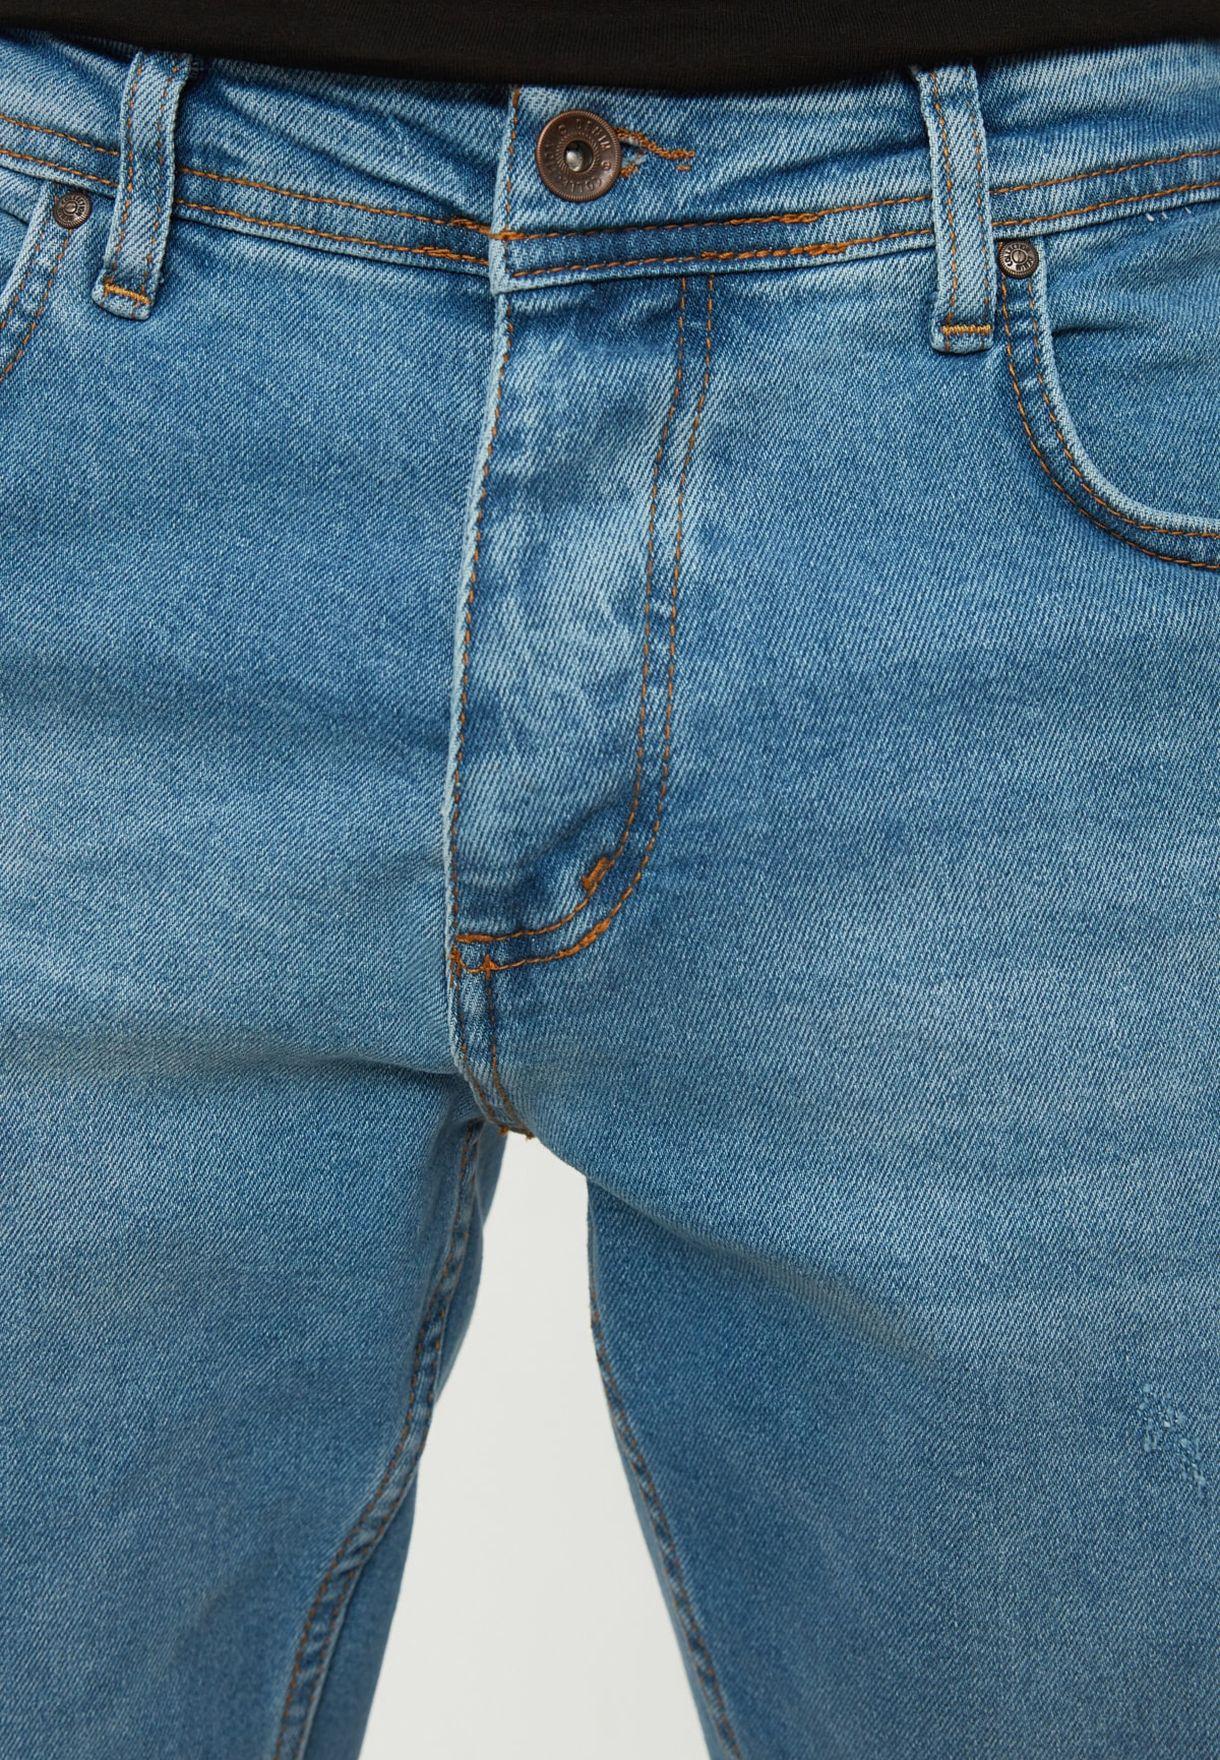 Regular Waist Rake Destroyed Slim Fit Jeans